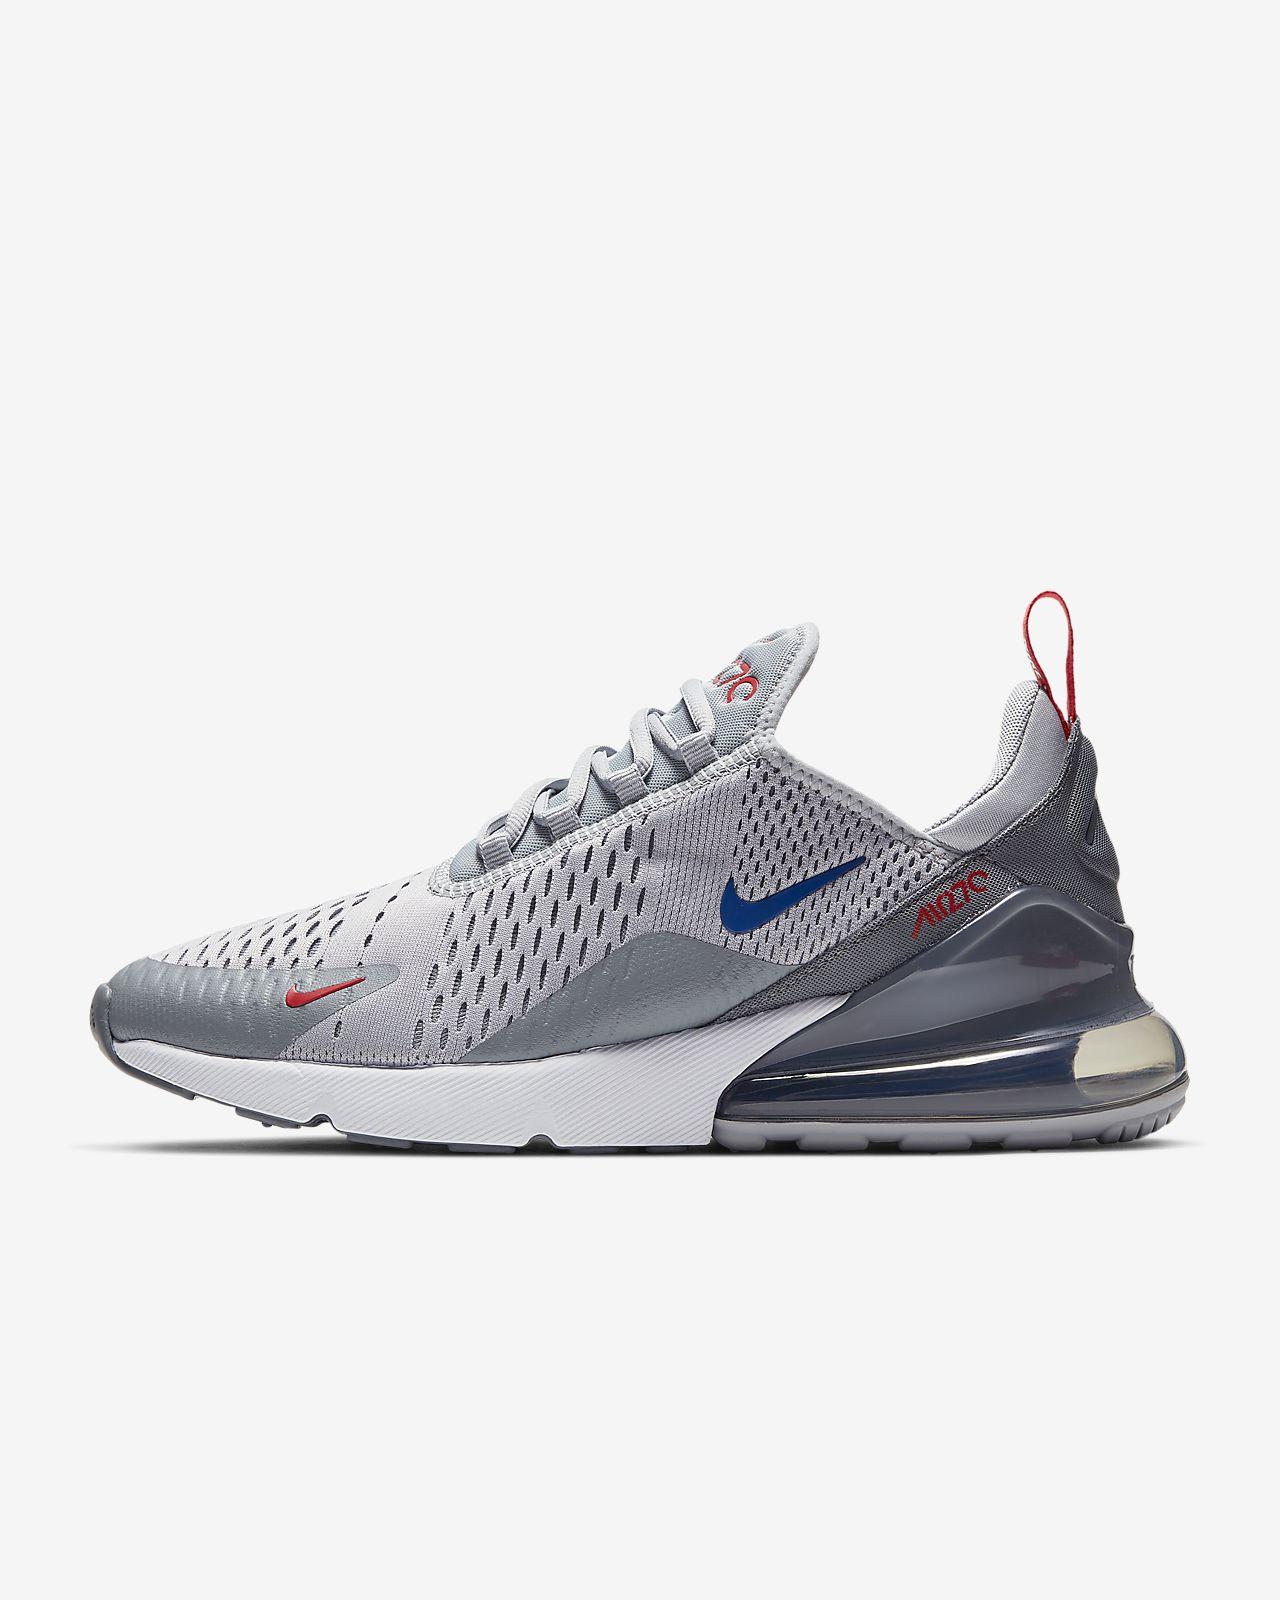 low priced 3b050 d1e6c Nike Air Max 270-sko til mænd